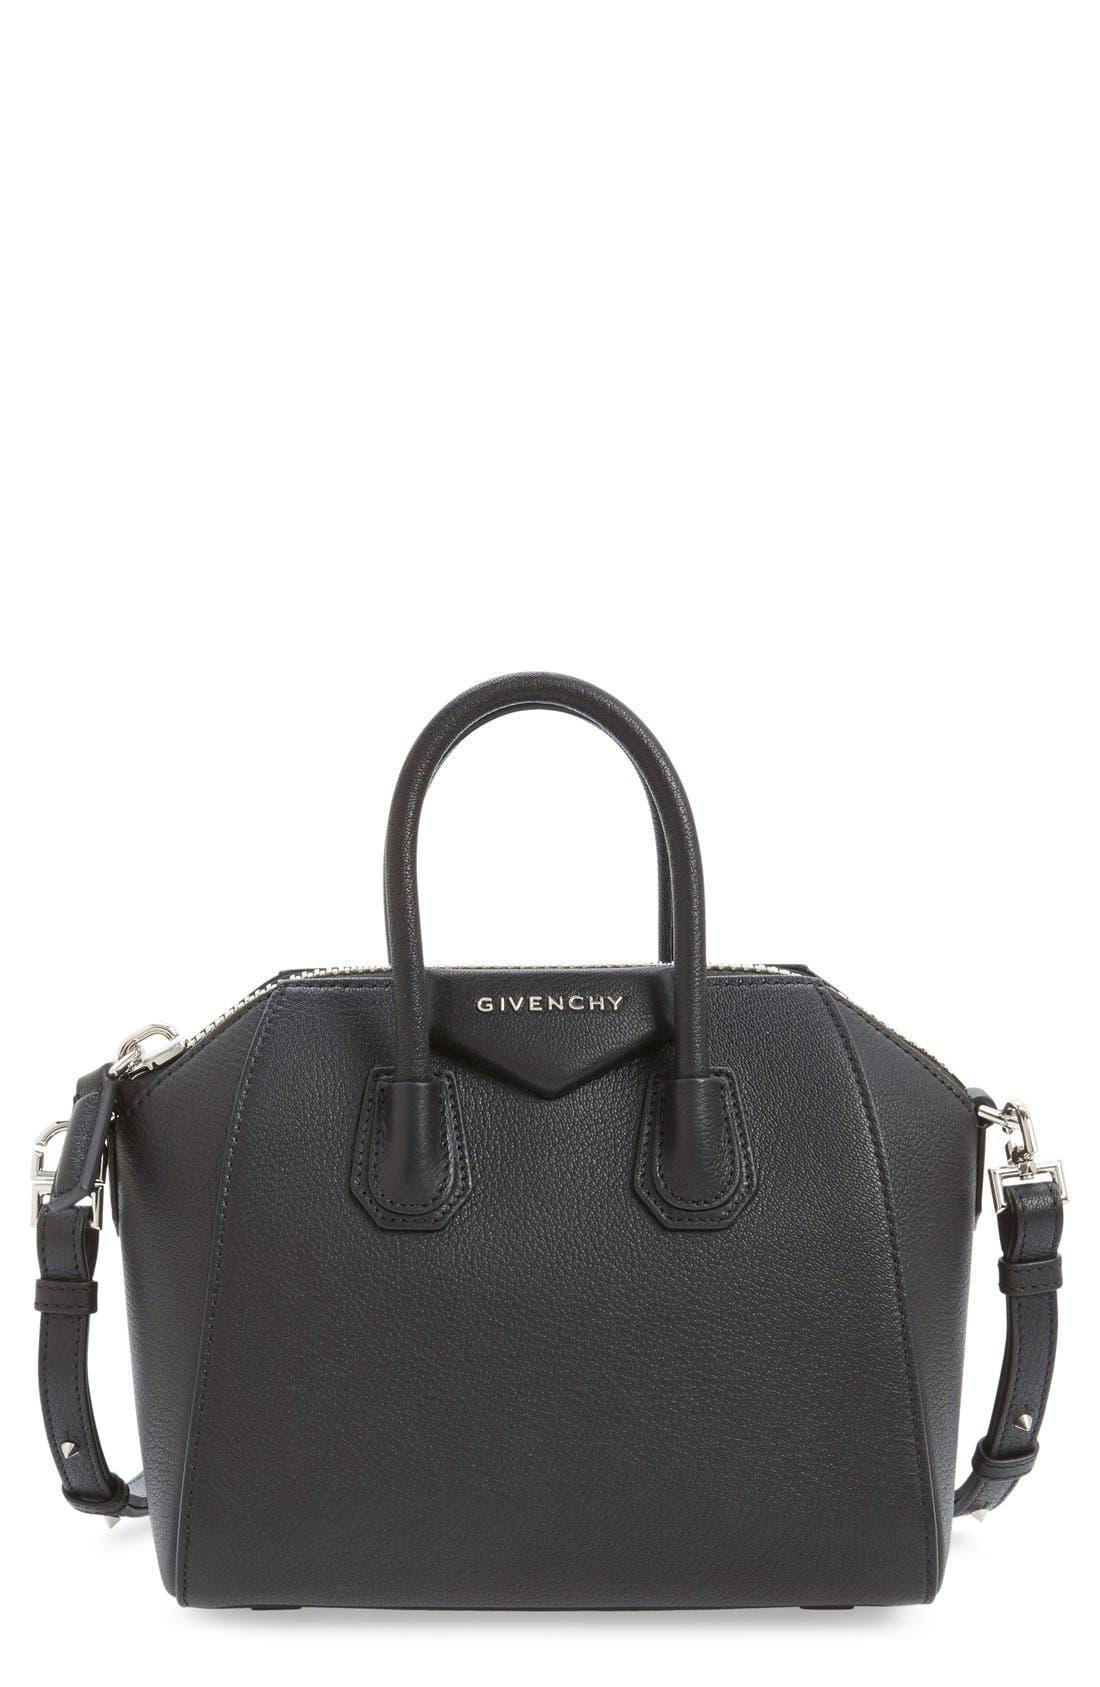 'Mini Antigona' Sugar Leather Satchel,                             Main thumbnail 1, color,                             BLACK